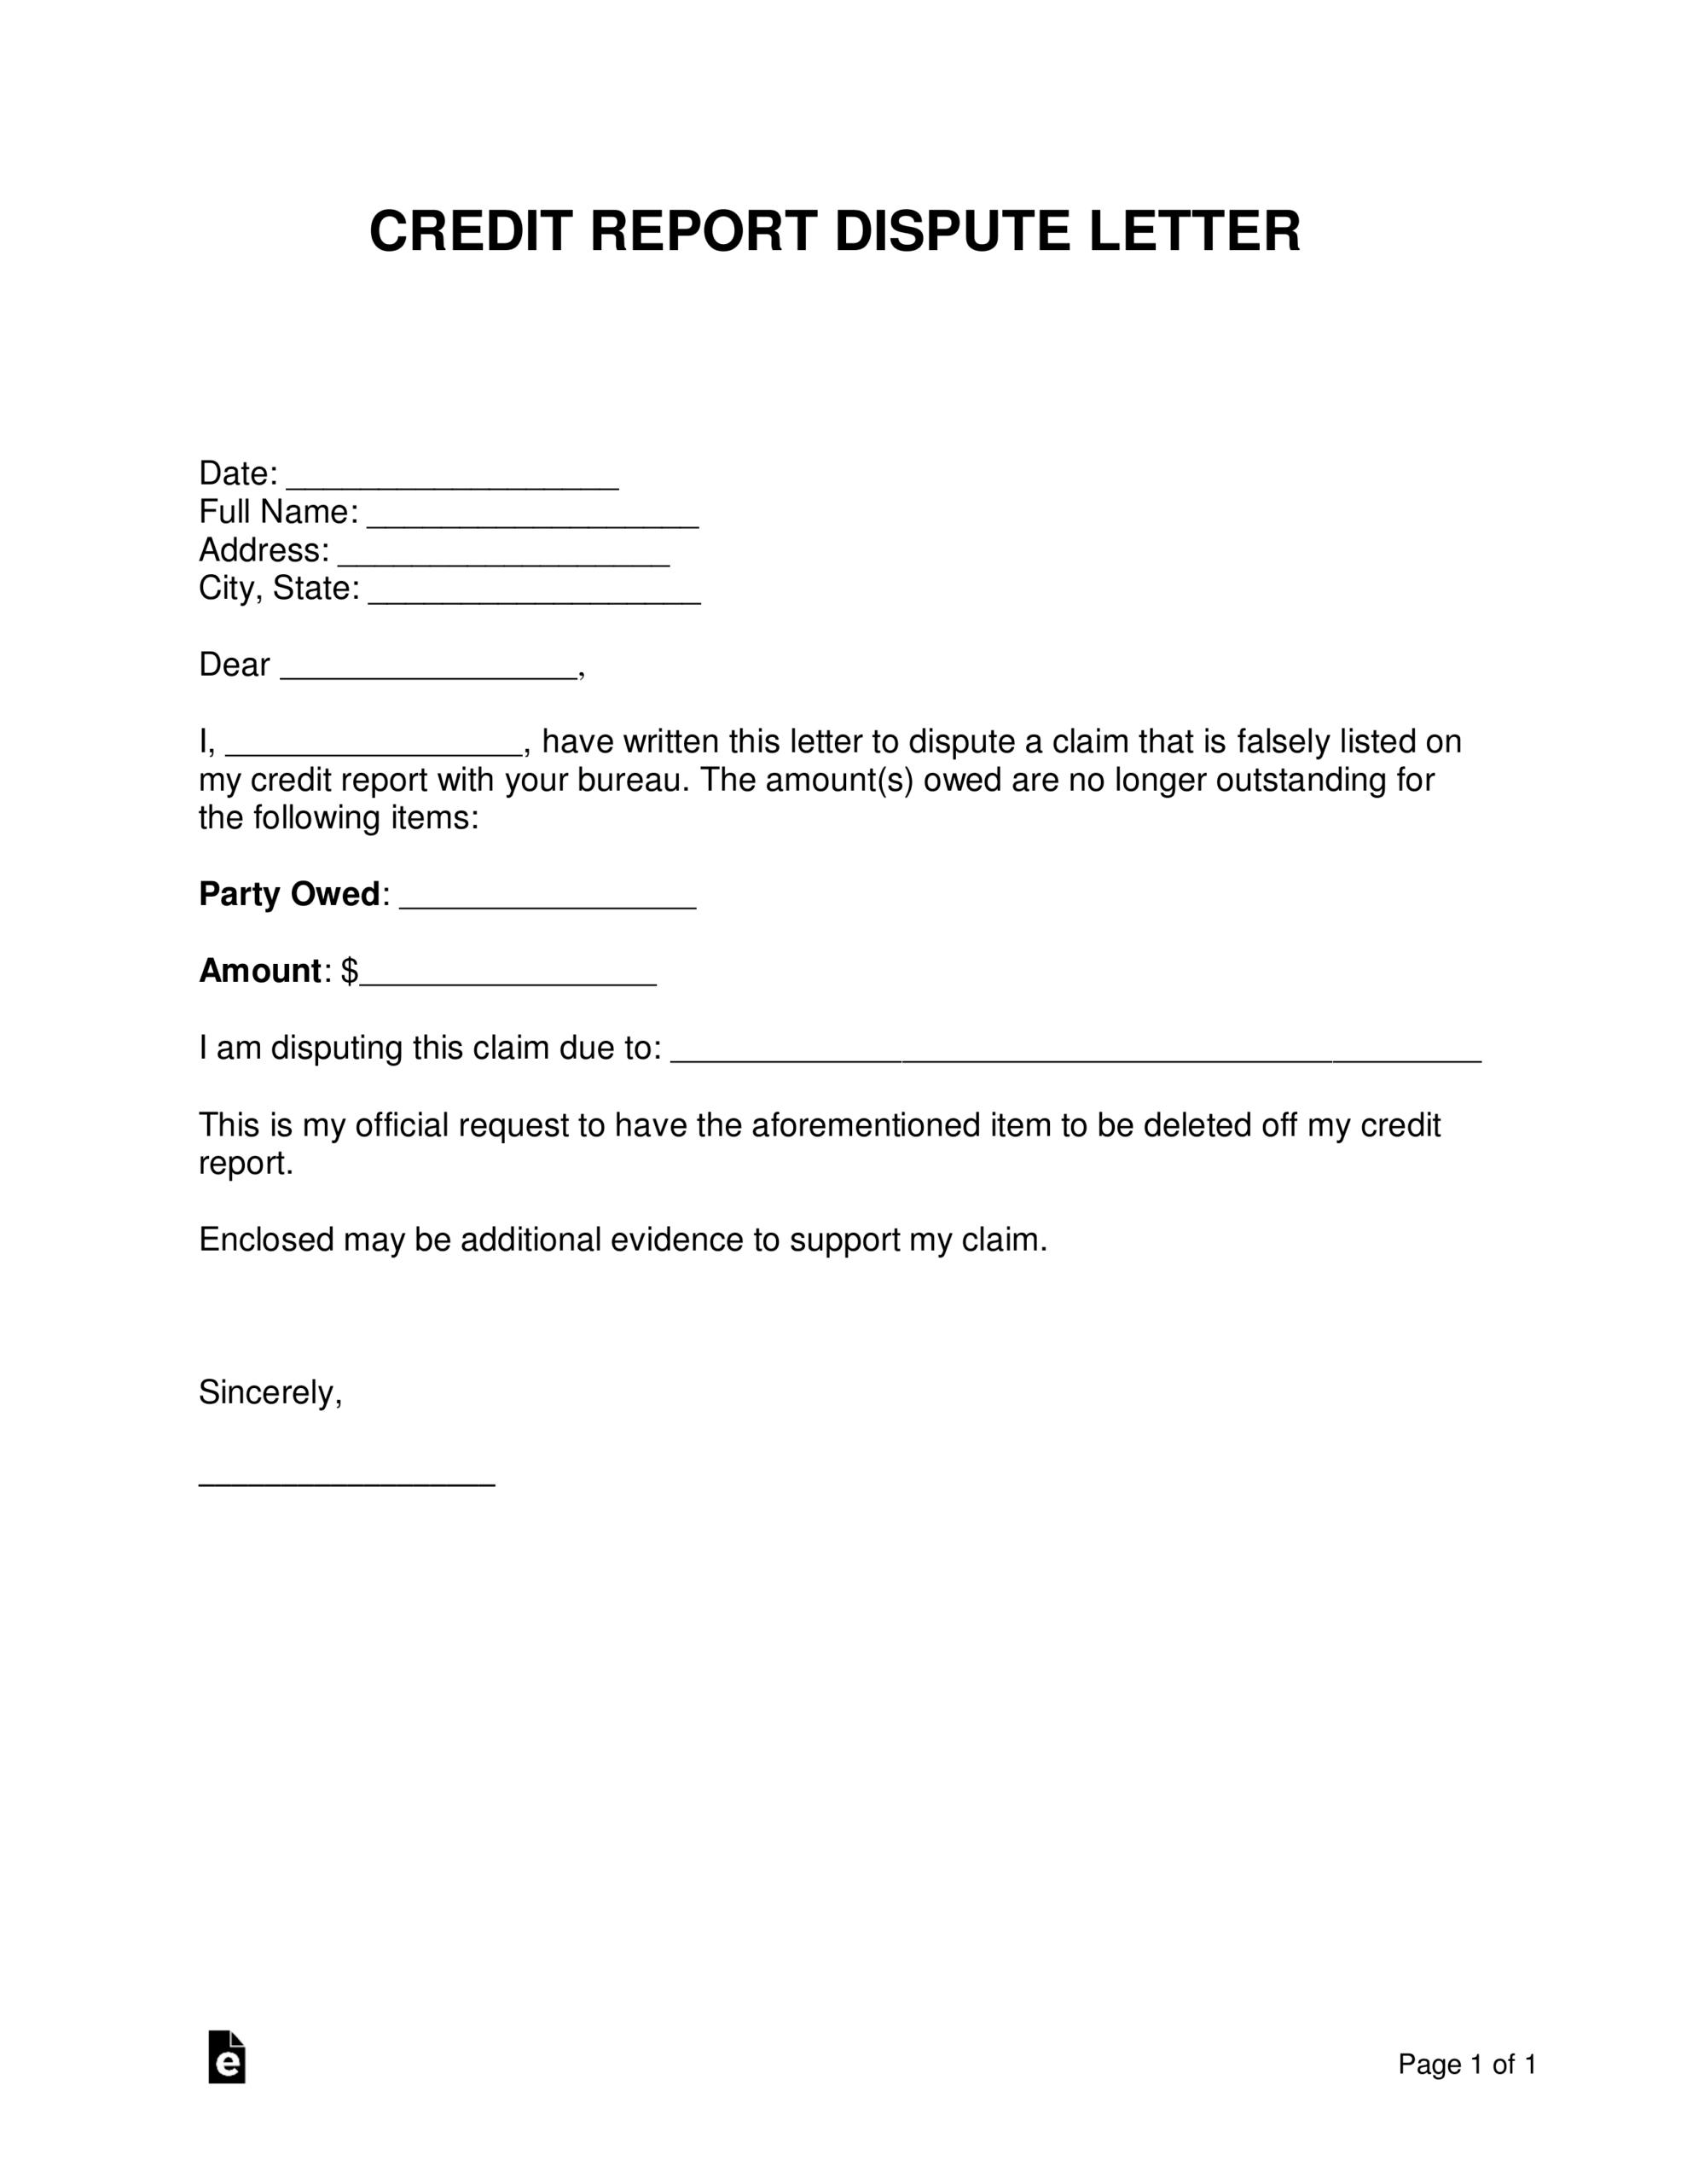 Free Credit Report Dispute Letter Template - Sample - Word In Credit Report Dispute Letter Template